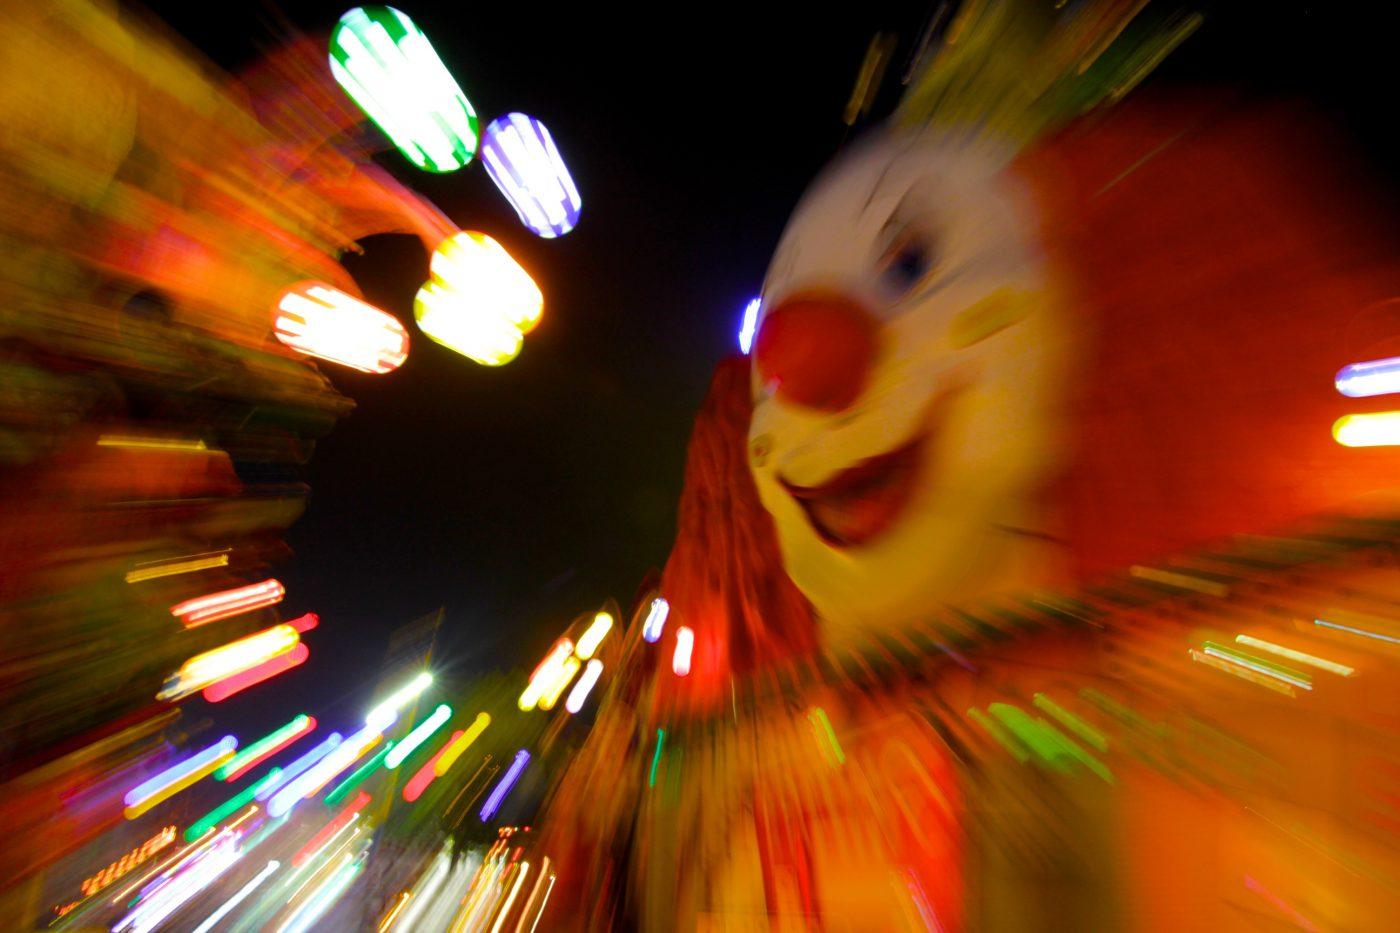 nightmare image of clown